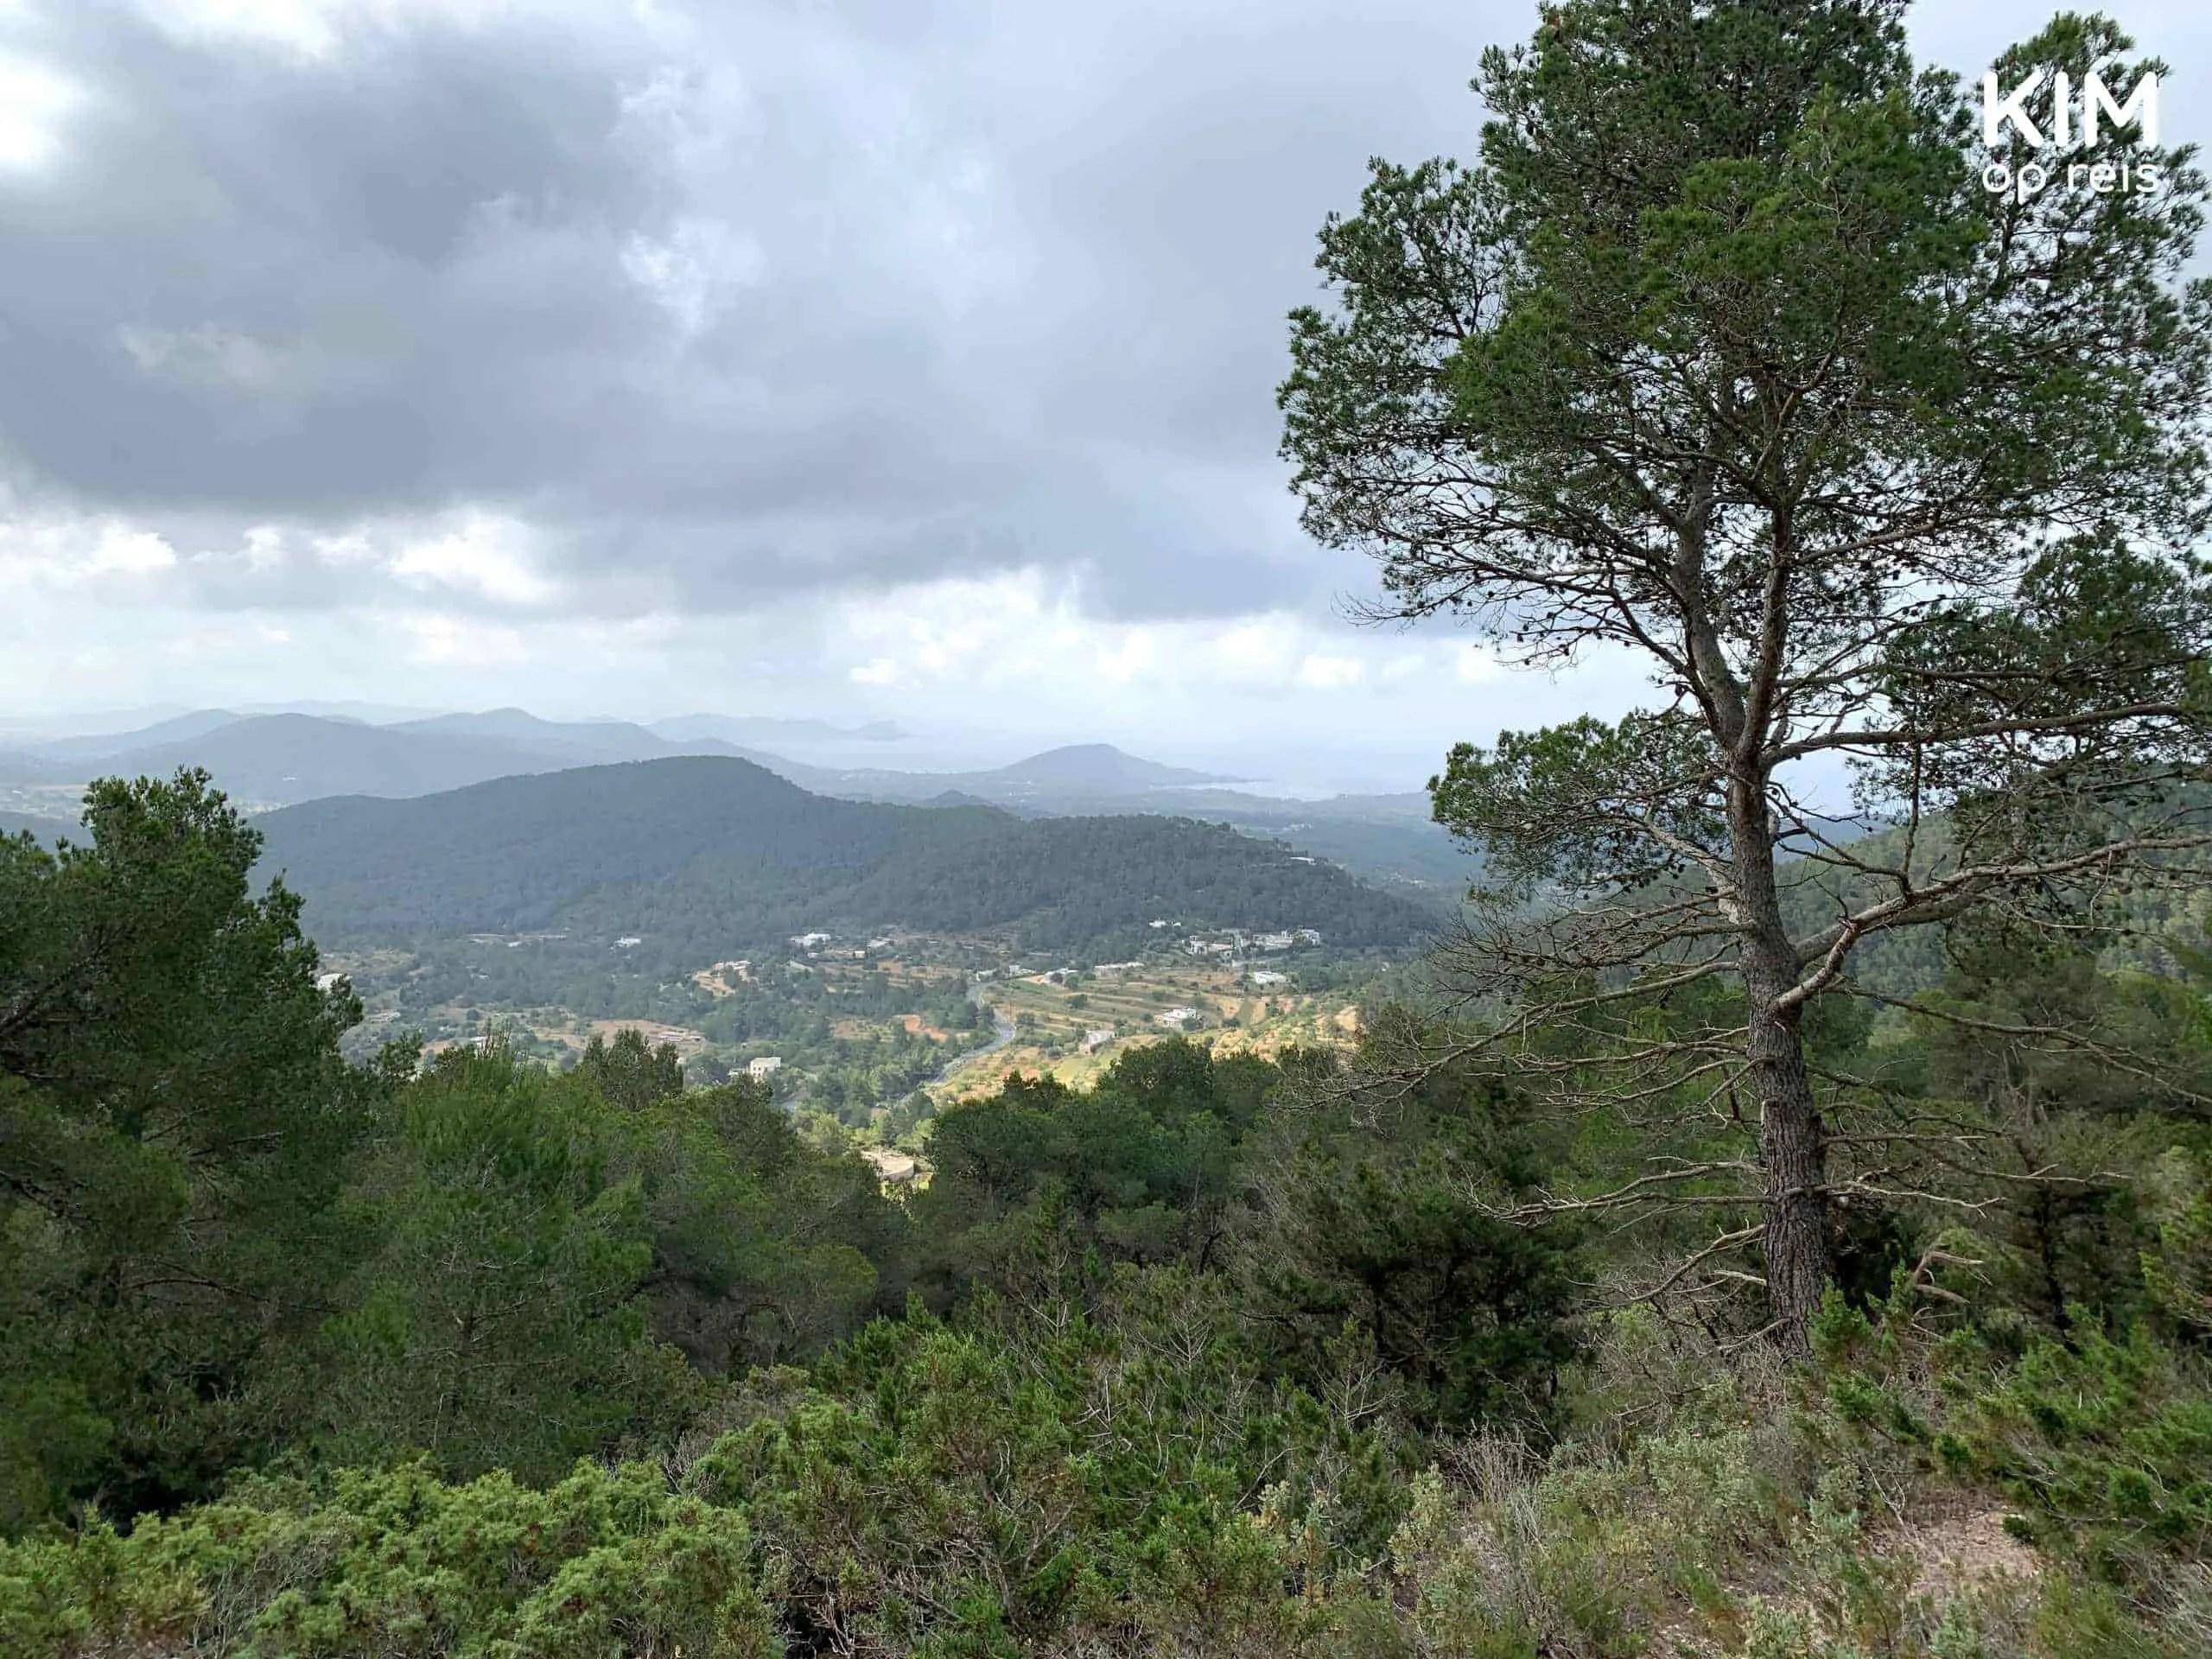 View Ibiza Sa Talaia mountain: hilly landscape, gray clouds